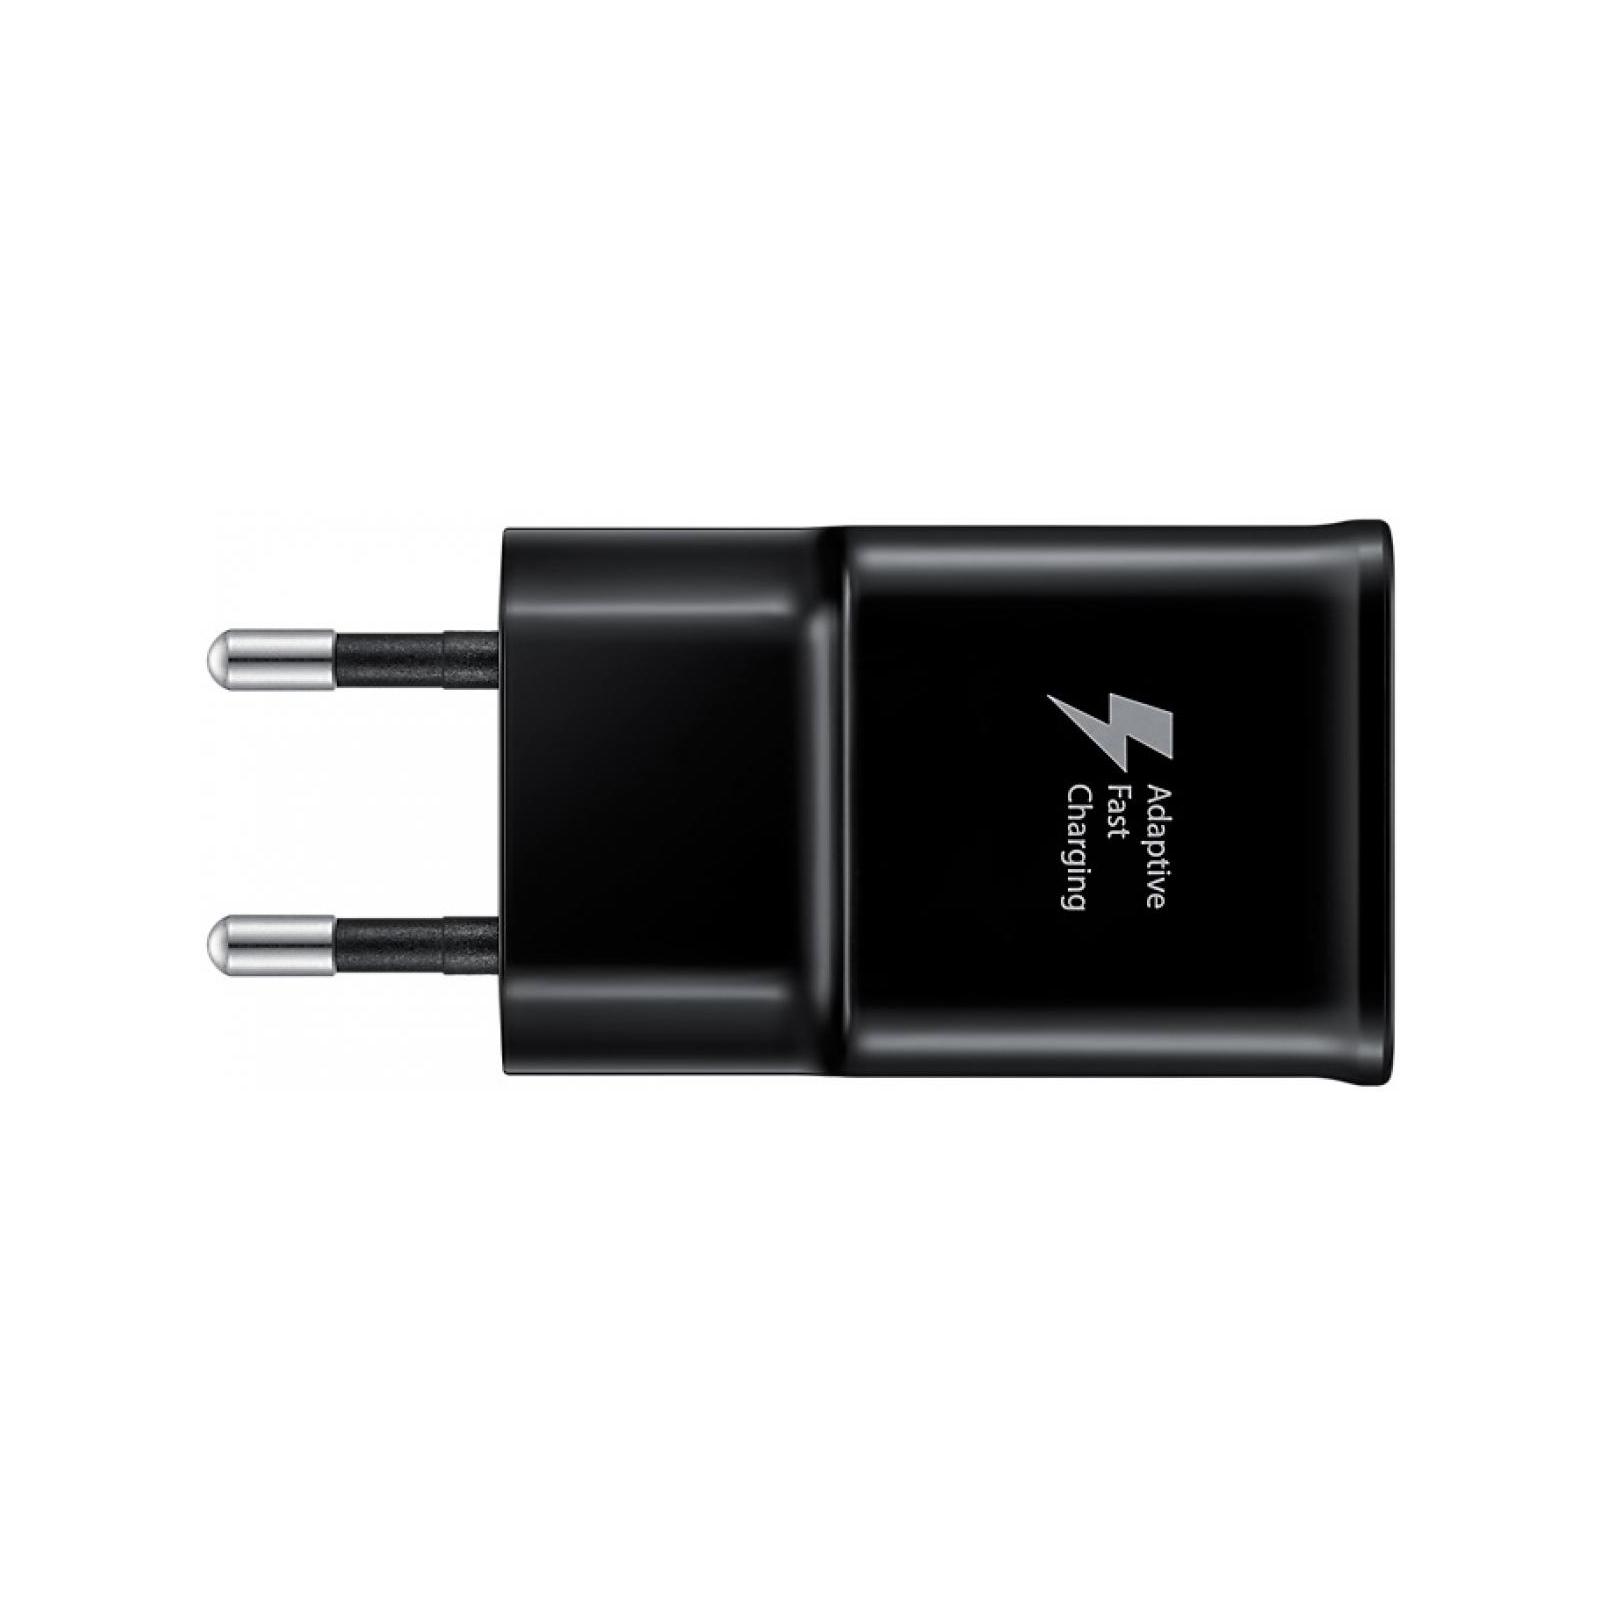 Зарядное устройство Samsung 2A + Type-C Cable (Fast Charging) Black (EP-TA20EBECGRU) изображение 3